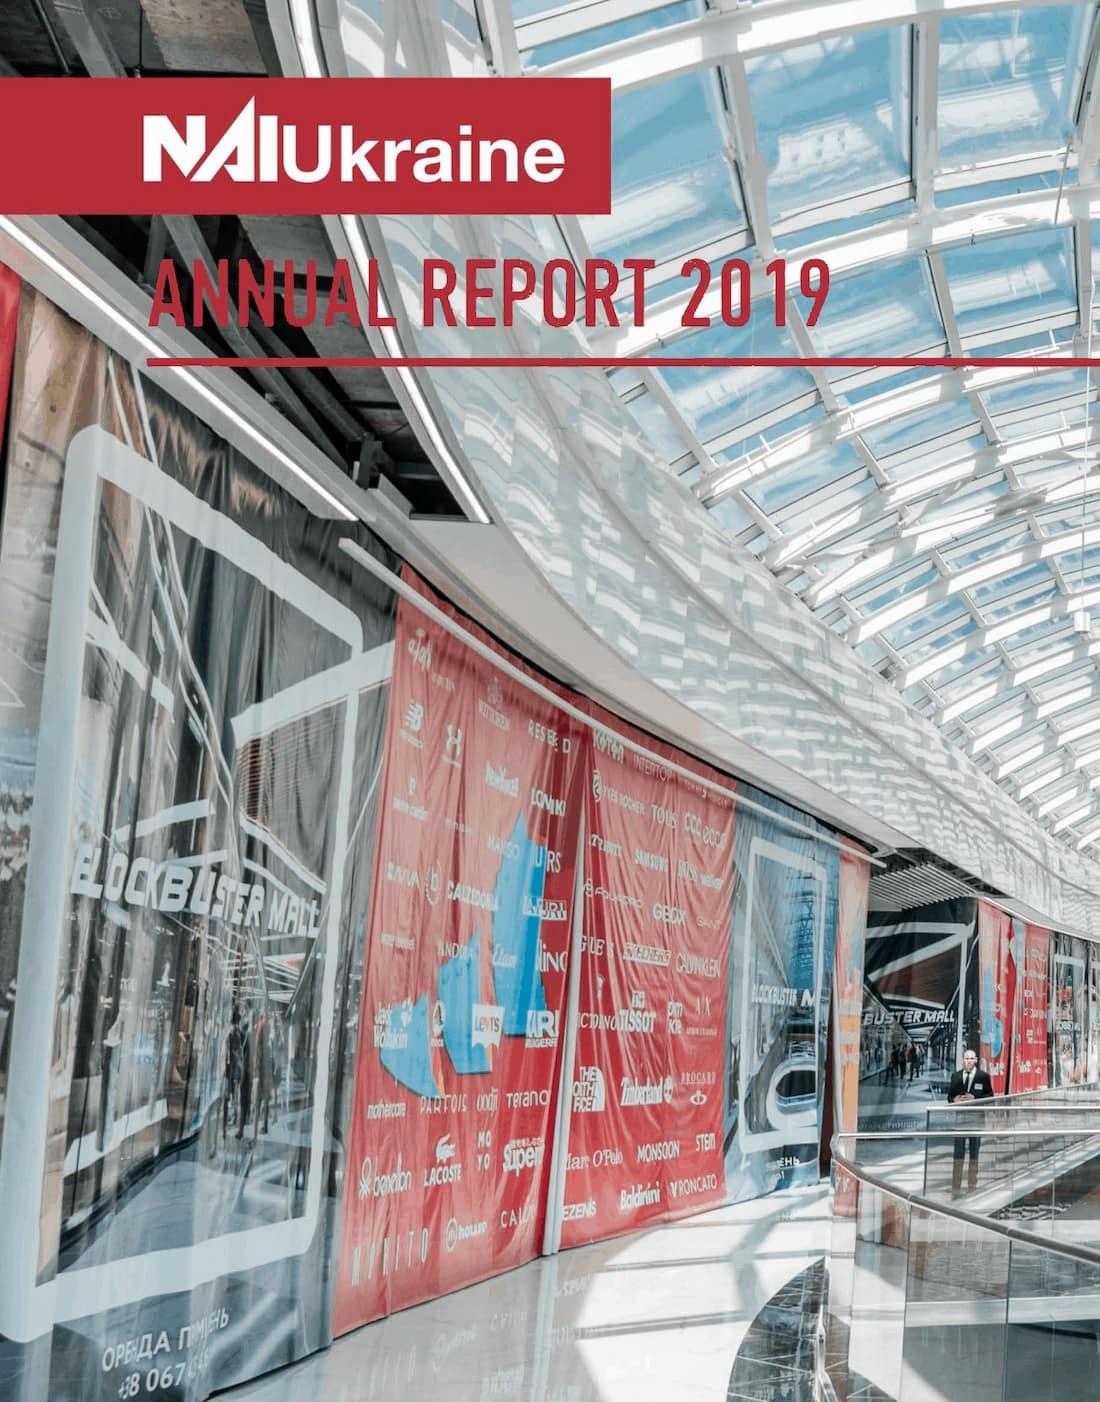 Годовой отчет NAI Ukraine за 2019 год